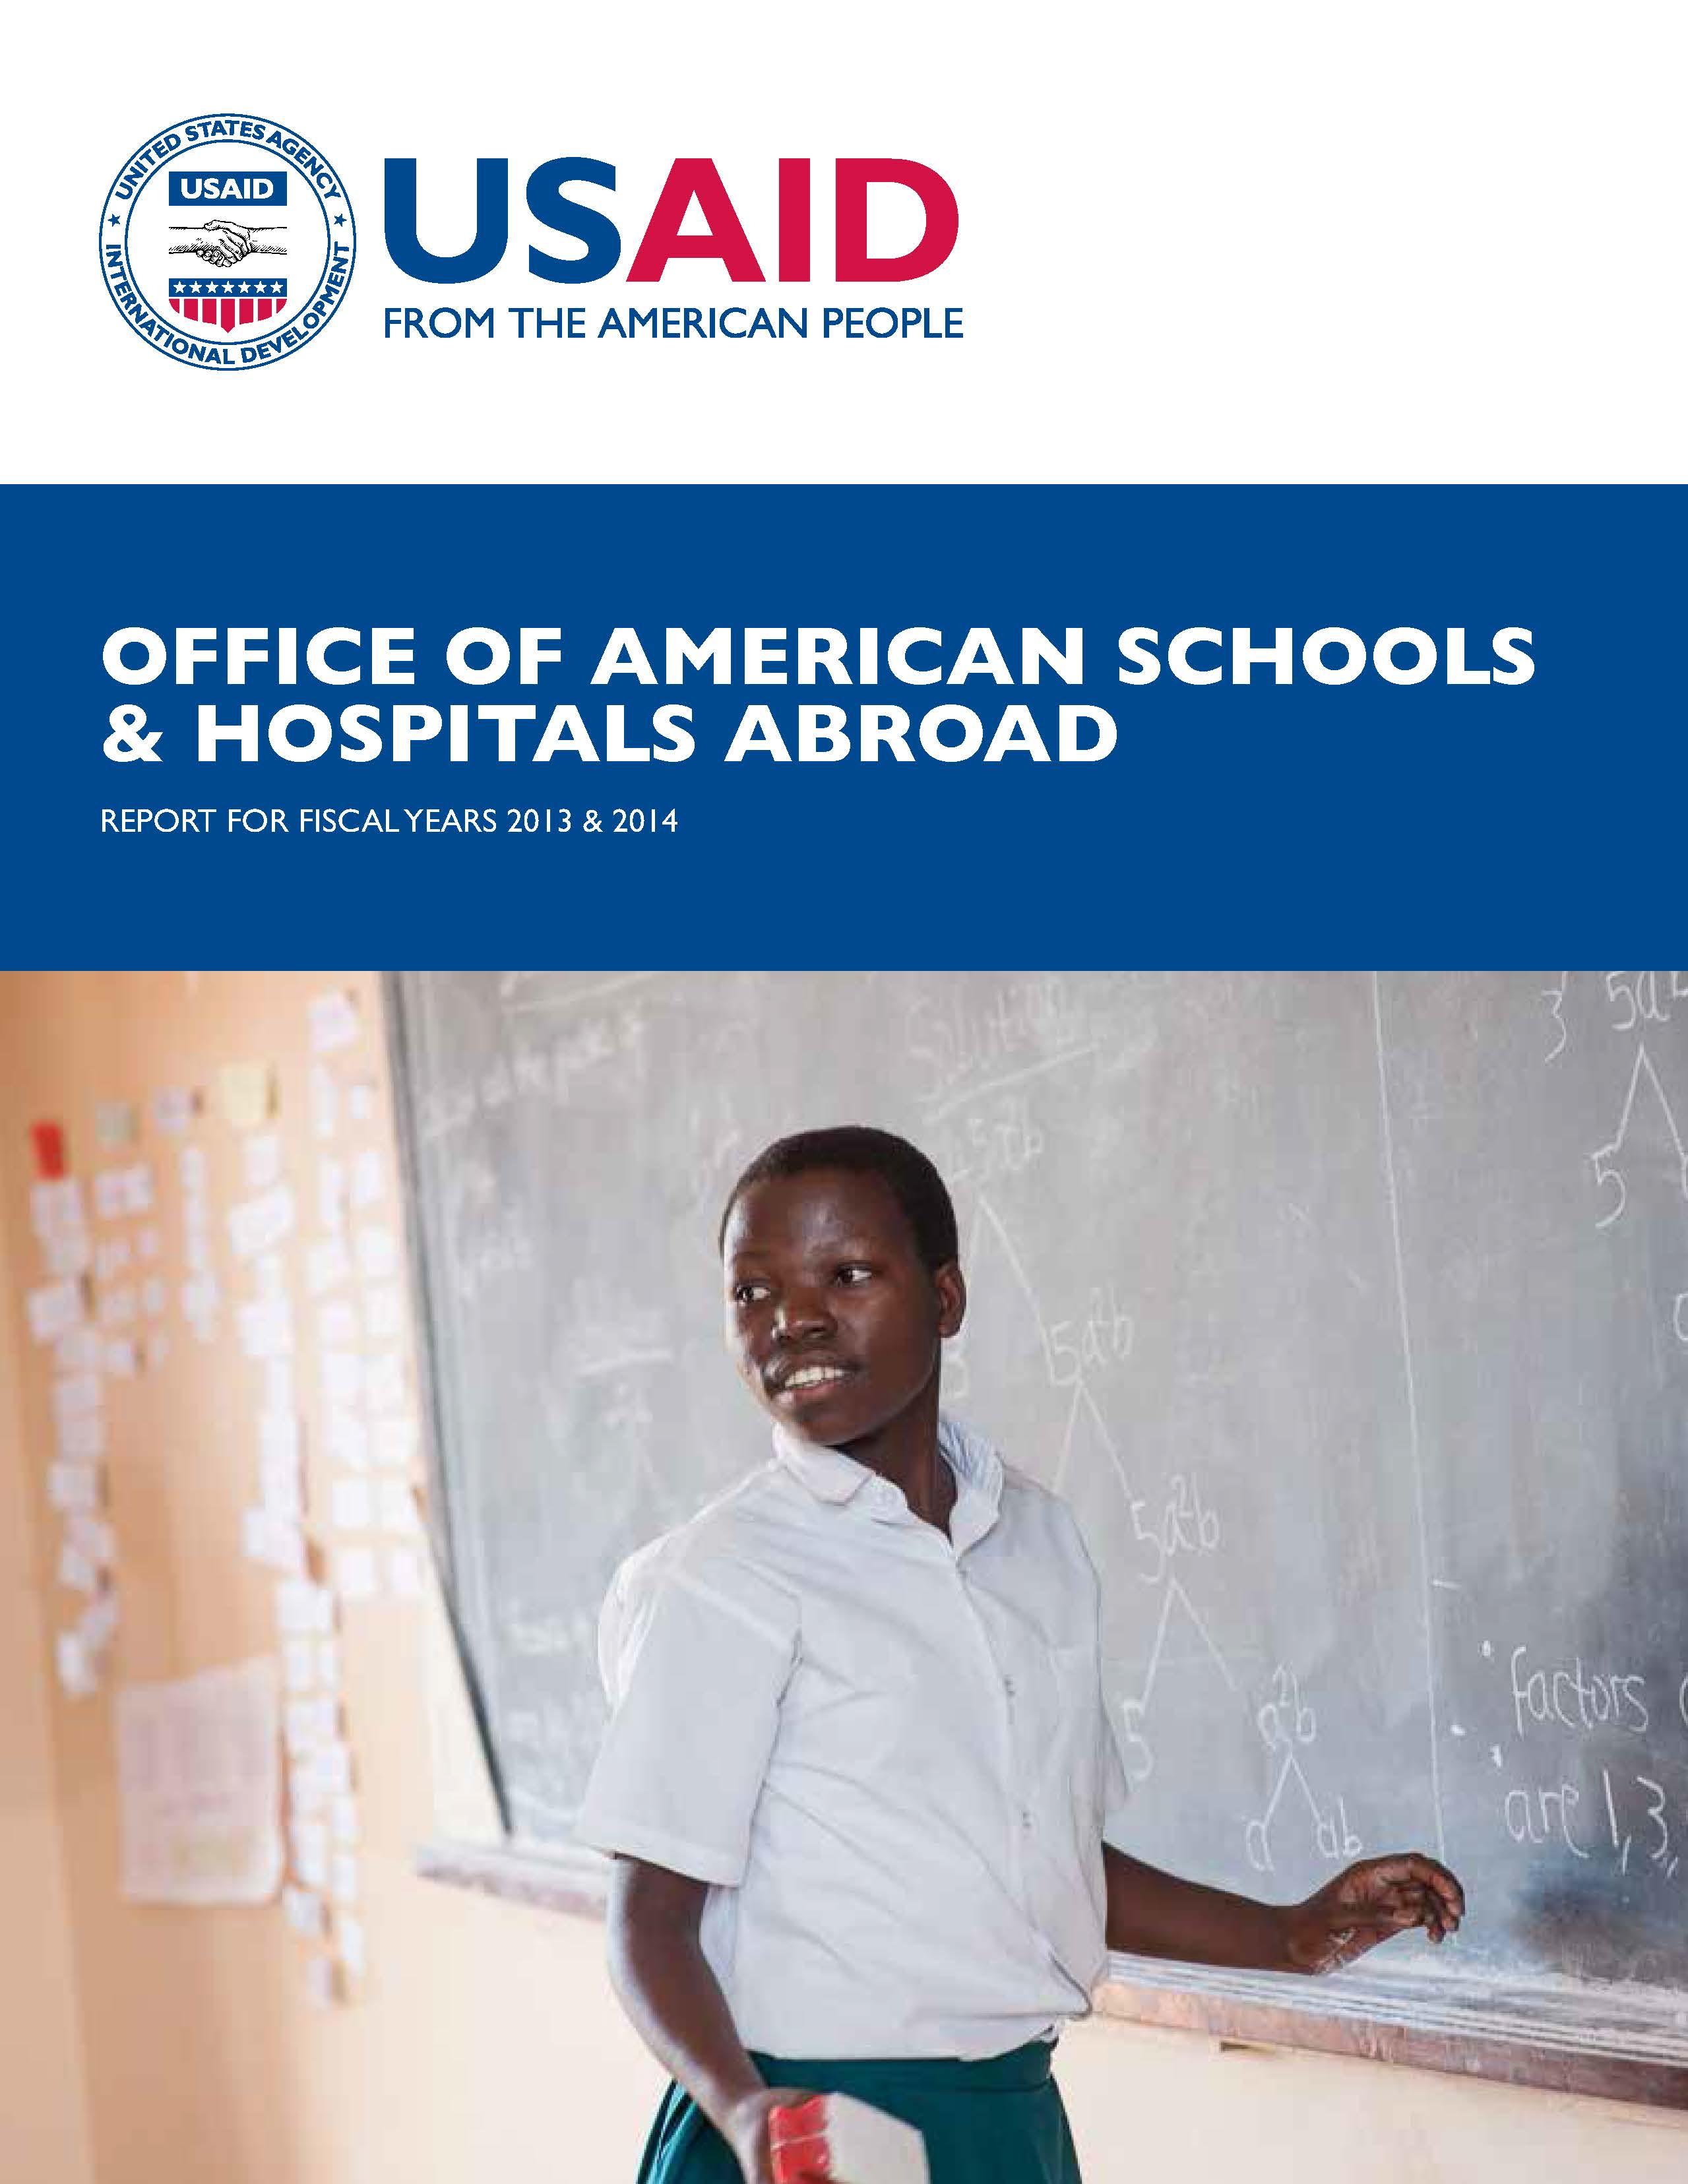 2013-14 USAID ASHA Annual Report